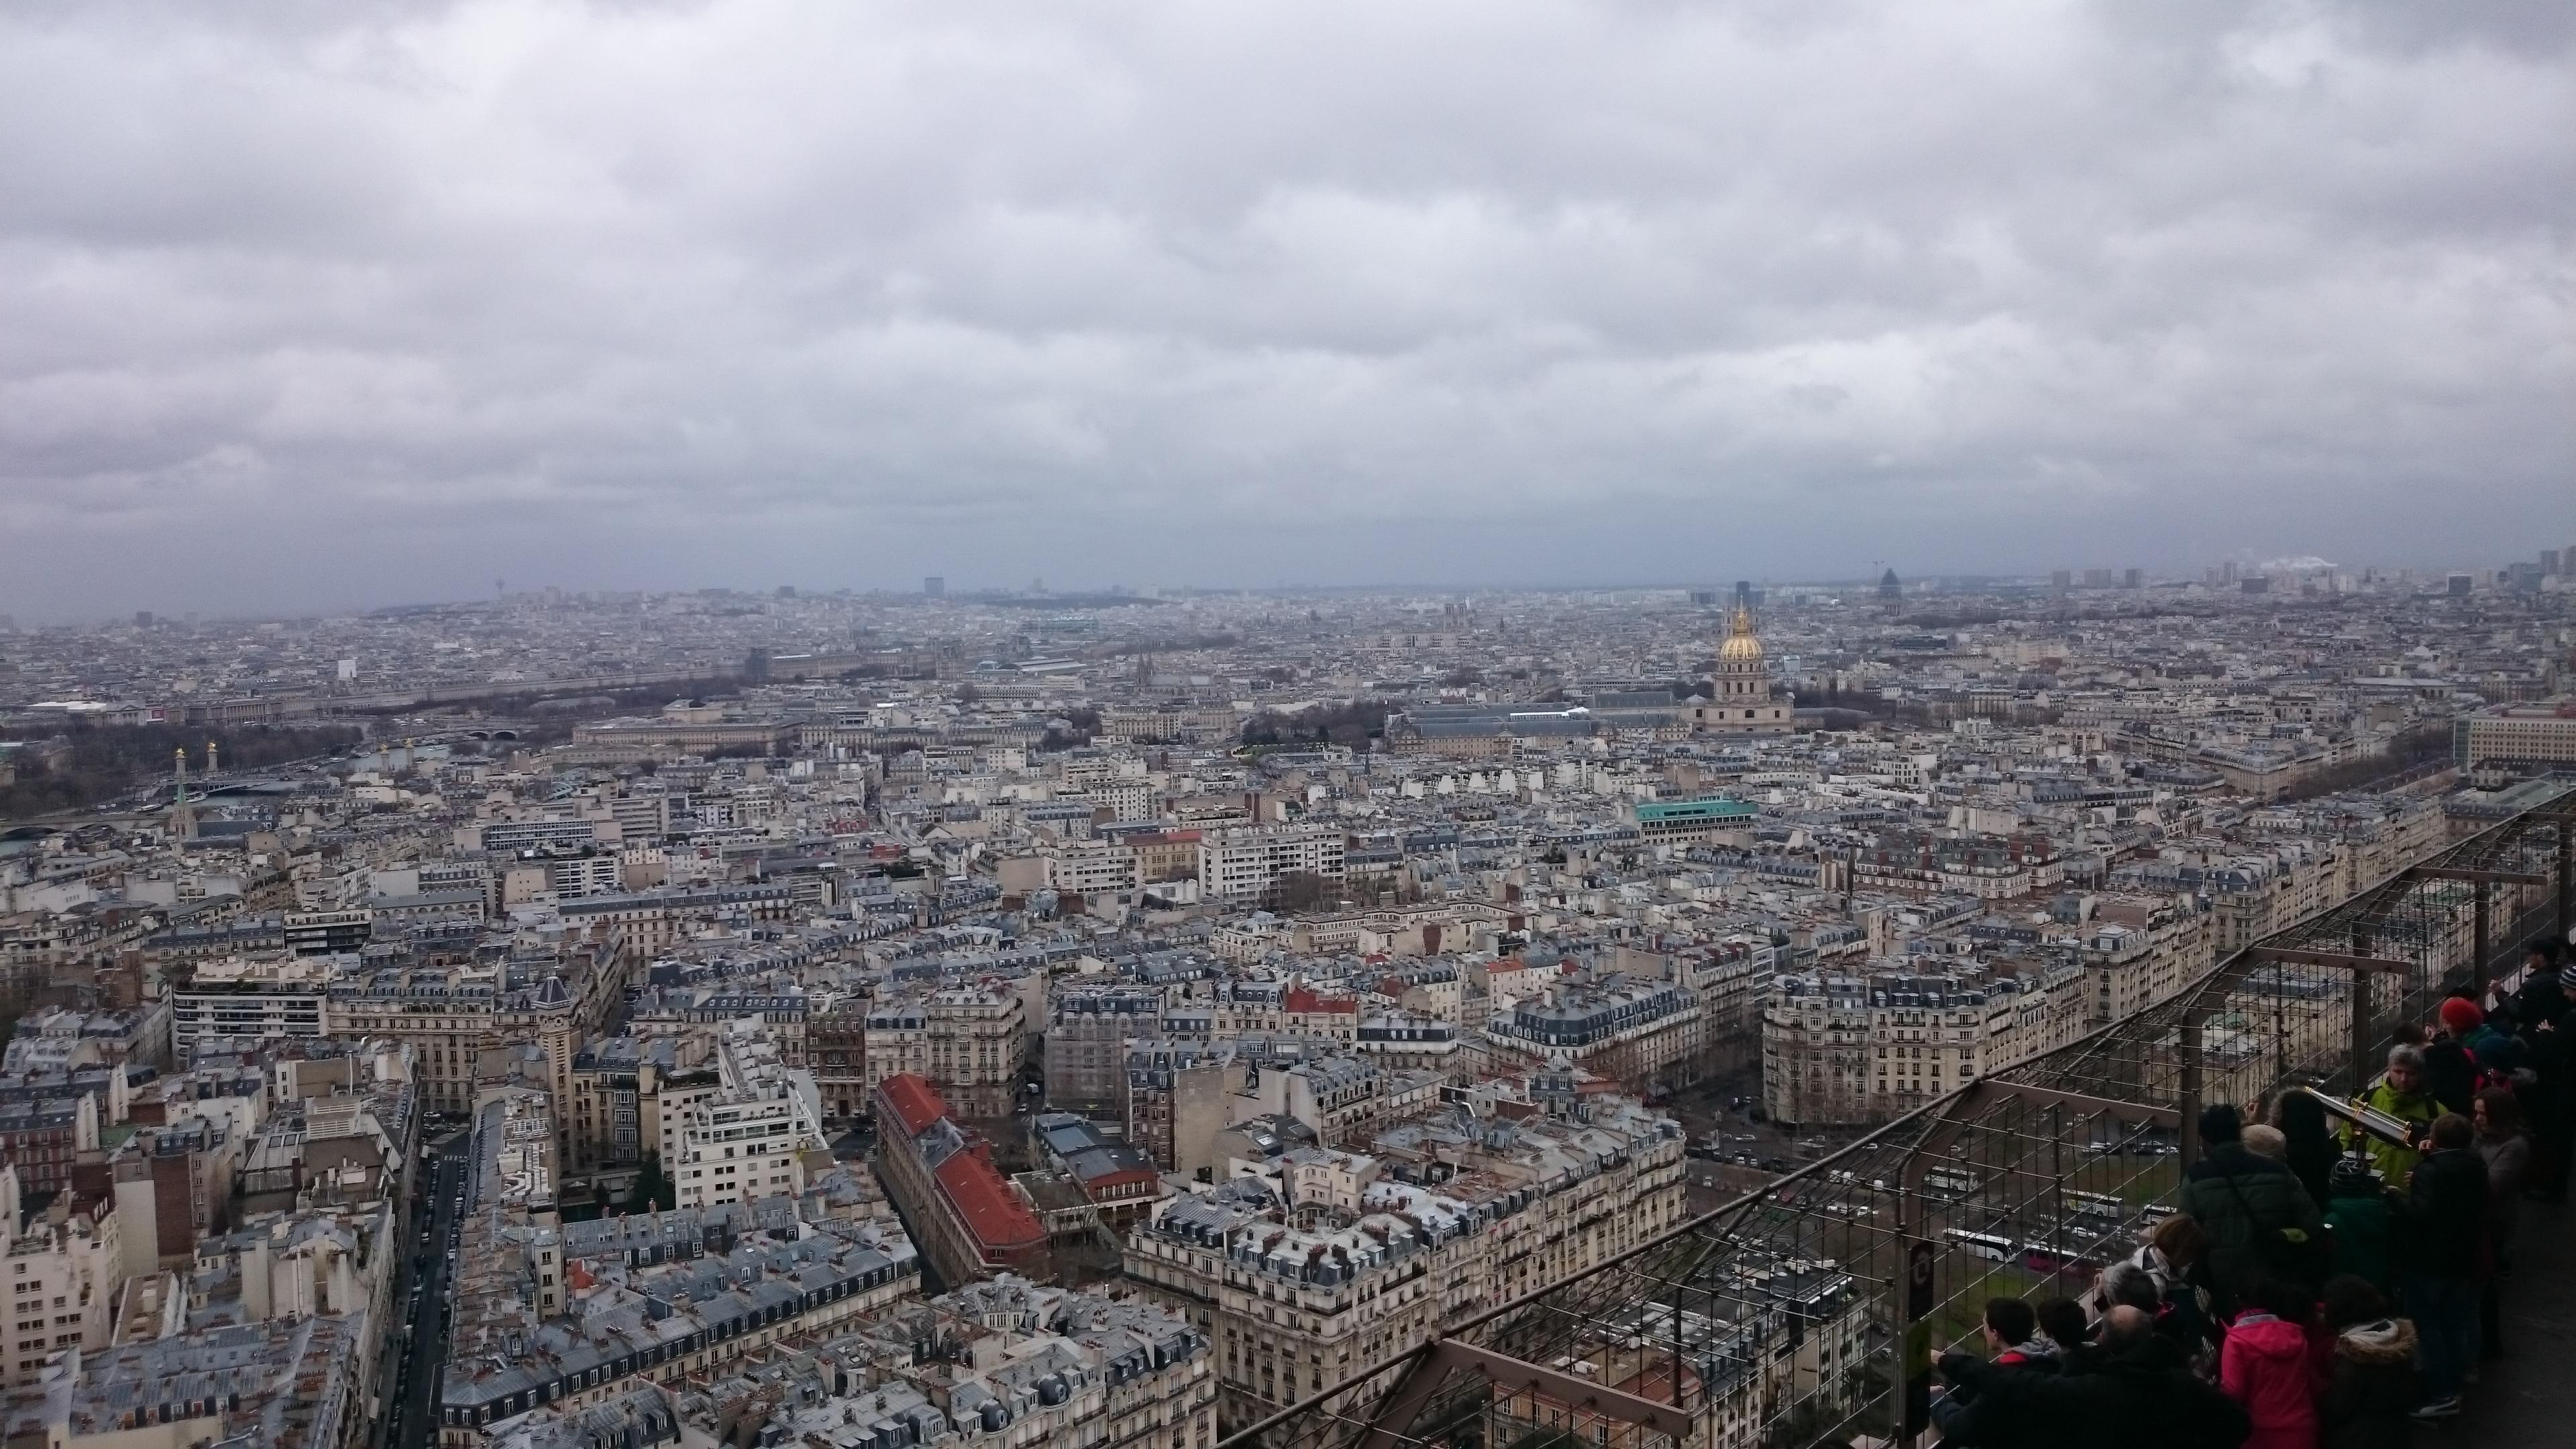 DSC 1941 - Visitando la Torre Eiffel en Paris